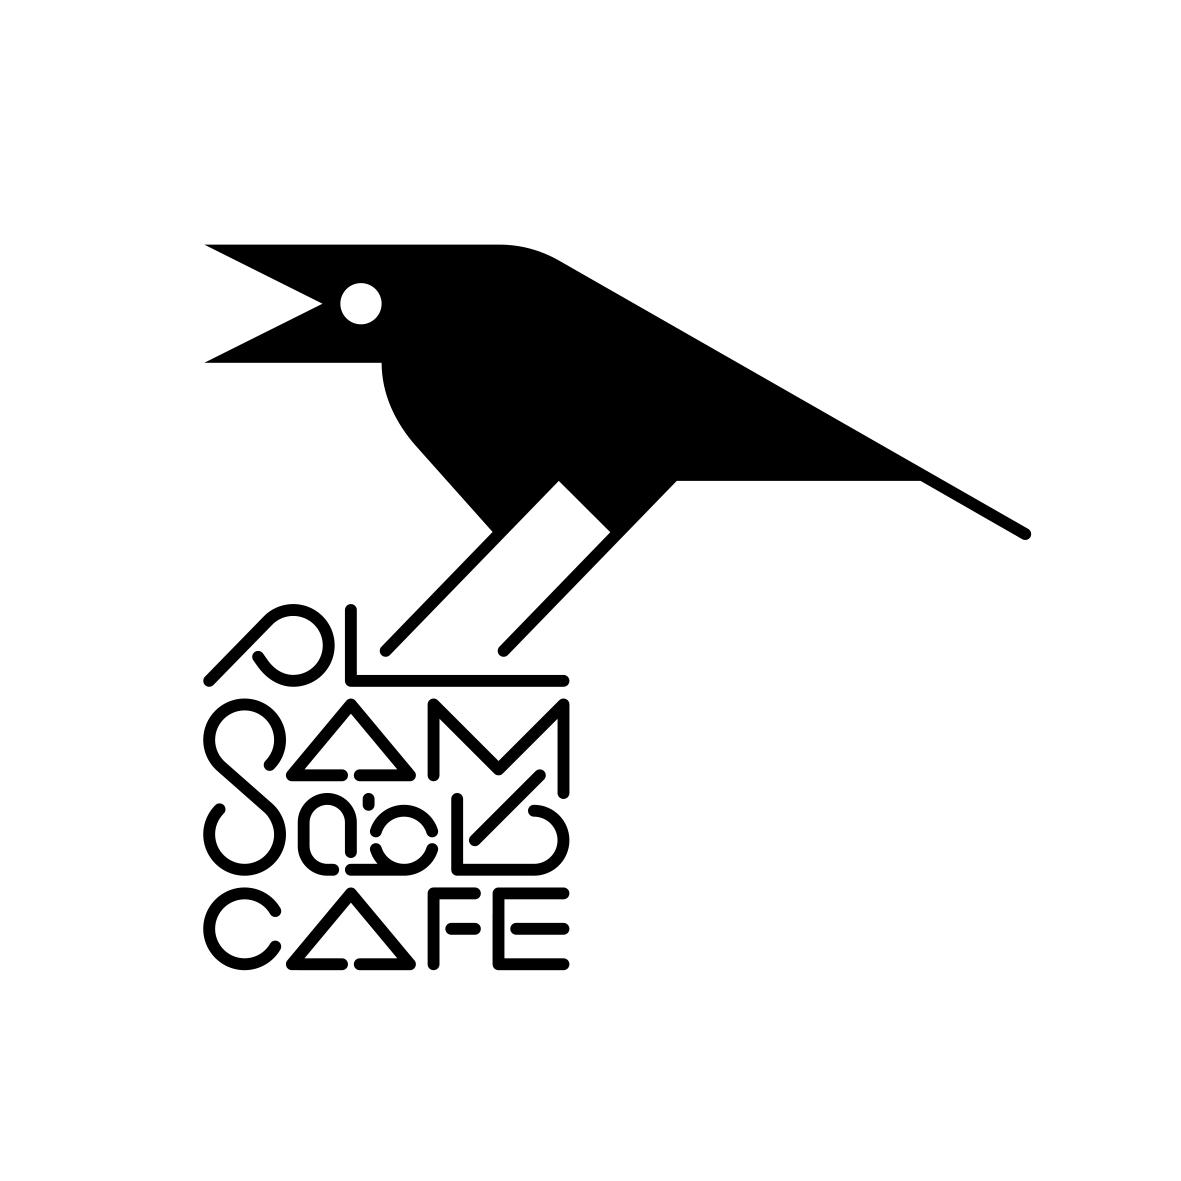 Sam cafe 2019